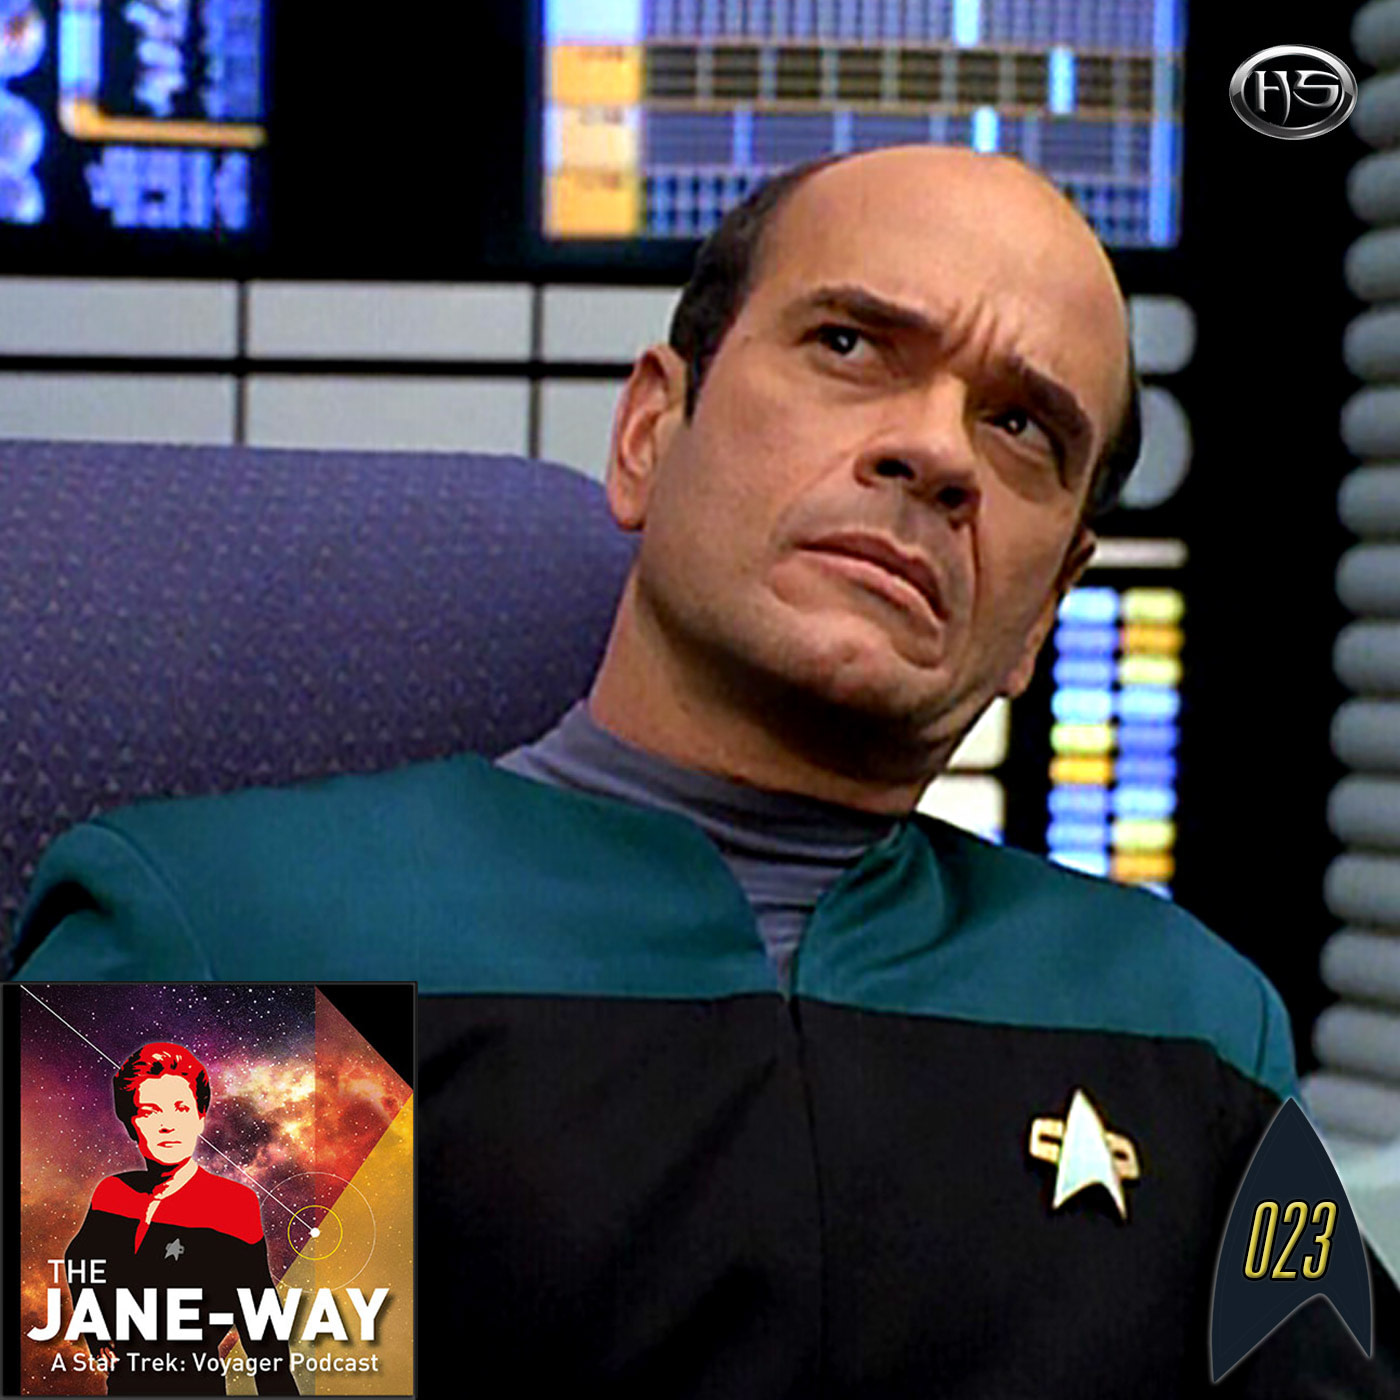 The Jane-Way Episode 23